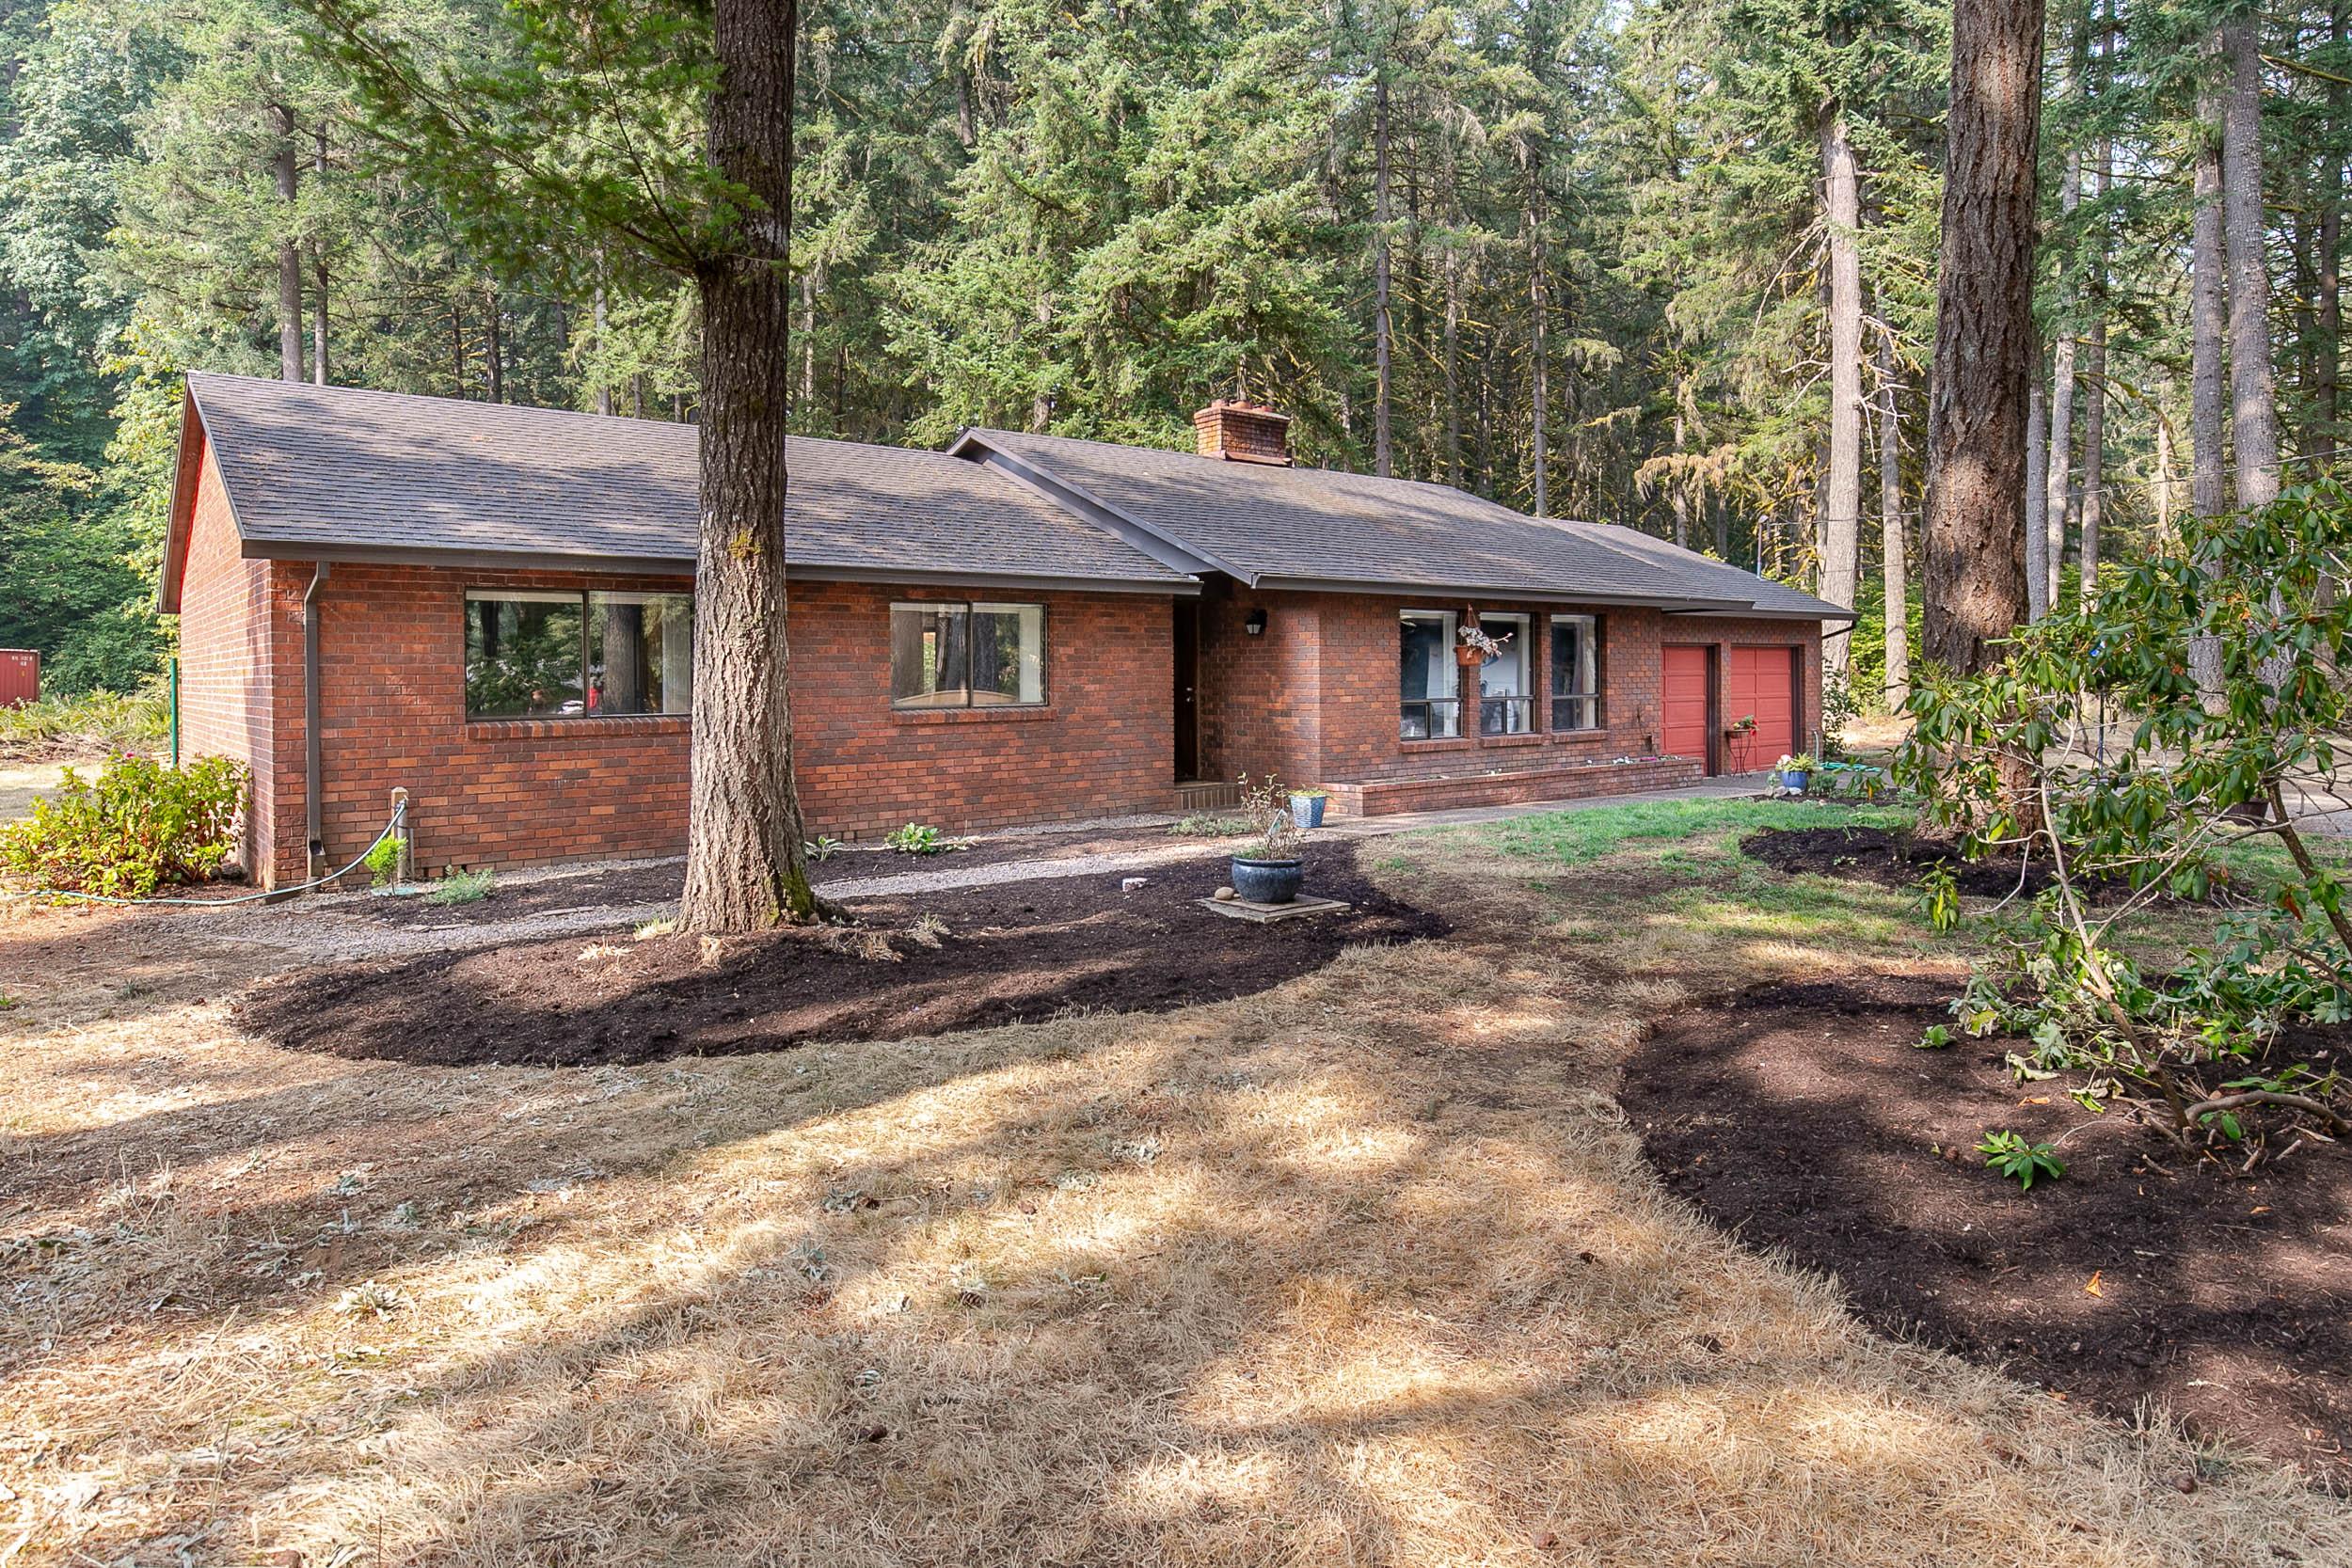 007_16181 S Eaden Rd Oregon City_MG_6620-HDR.jpg